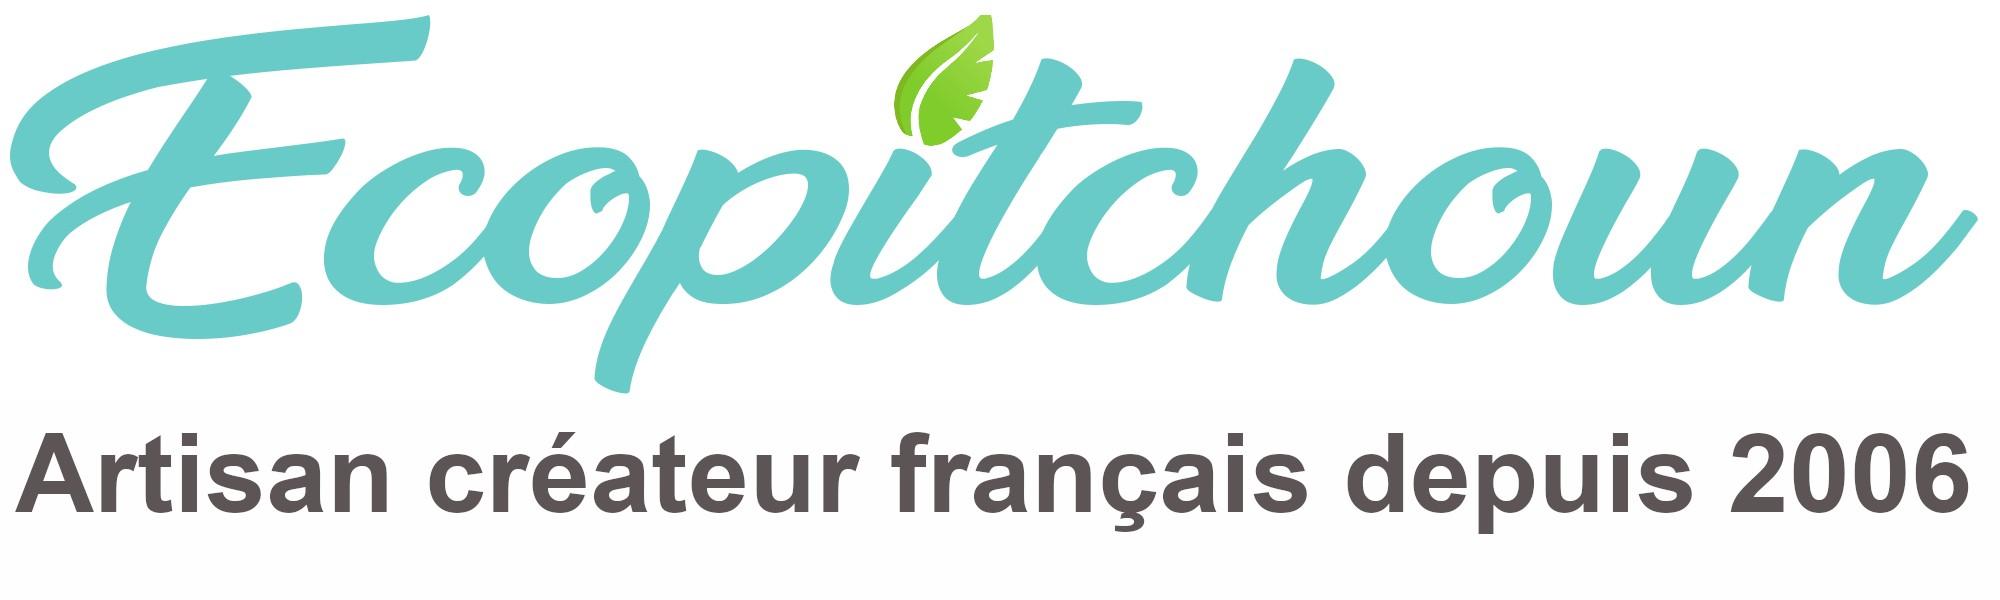 Ecopitchoun